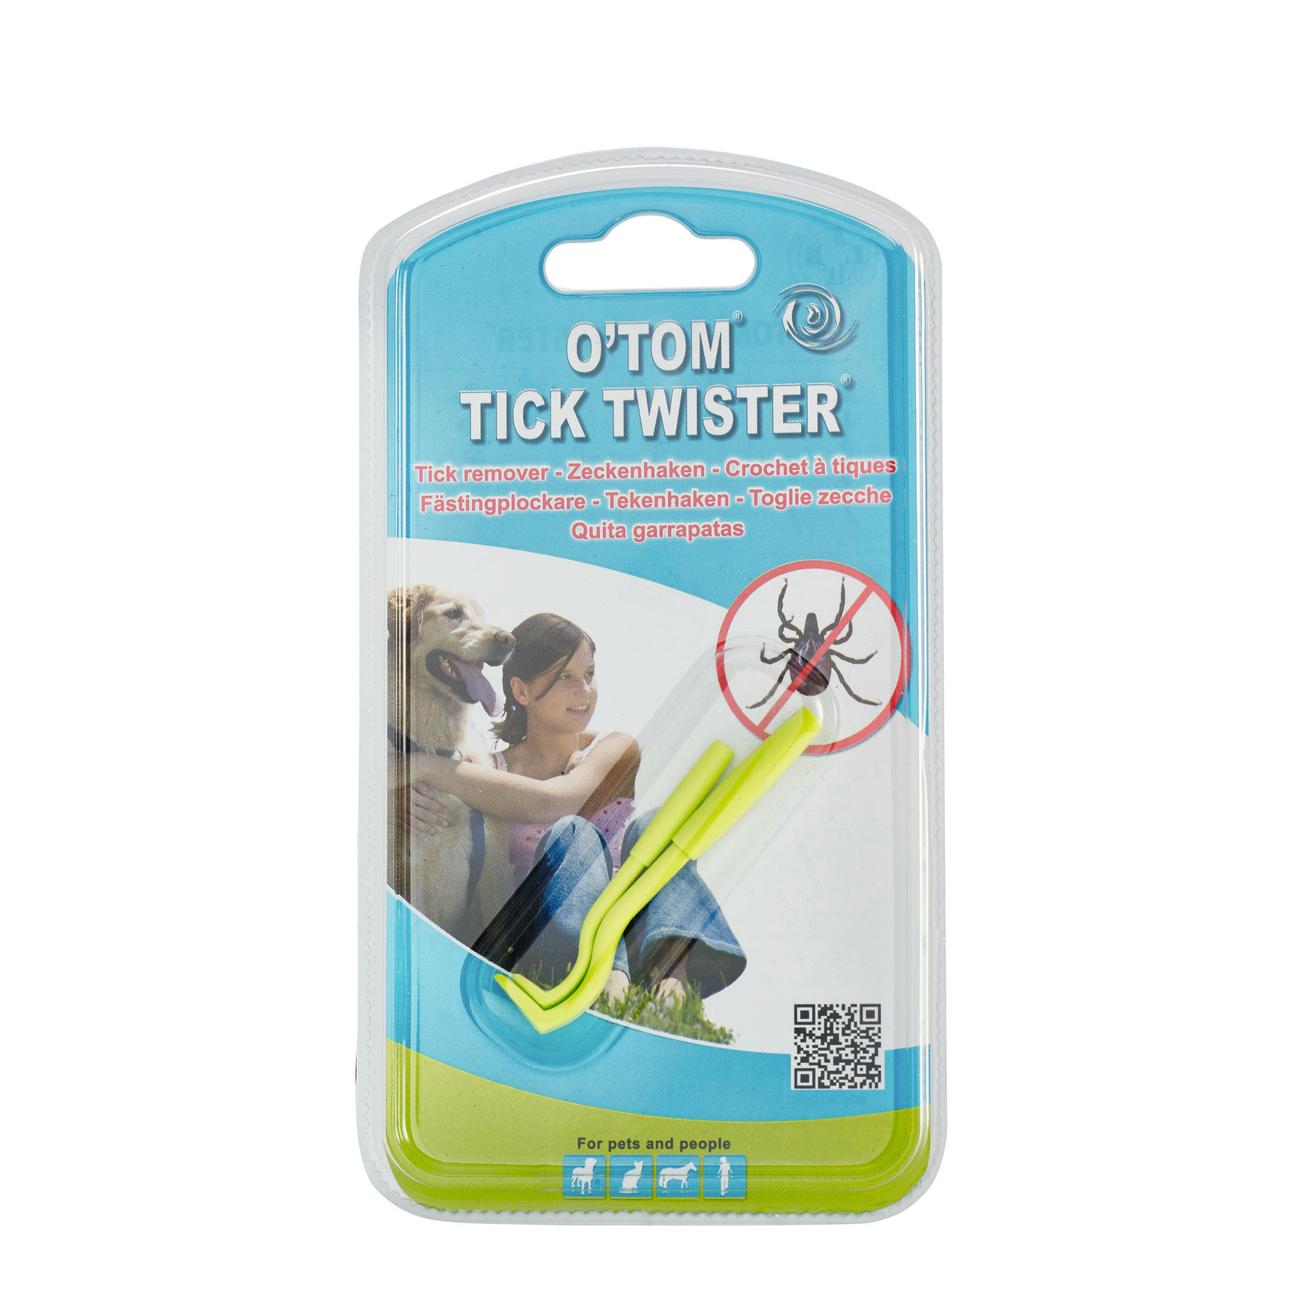 O'Tom Zeckenhaken O'Tom Tick Twister, Bild 2